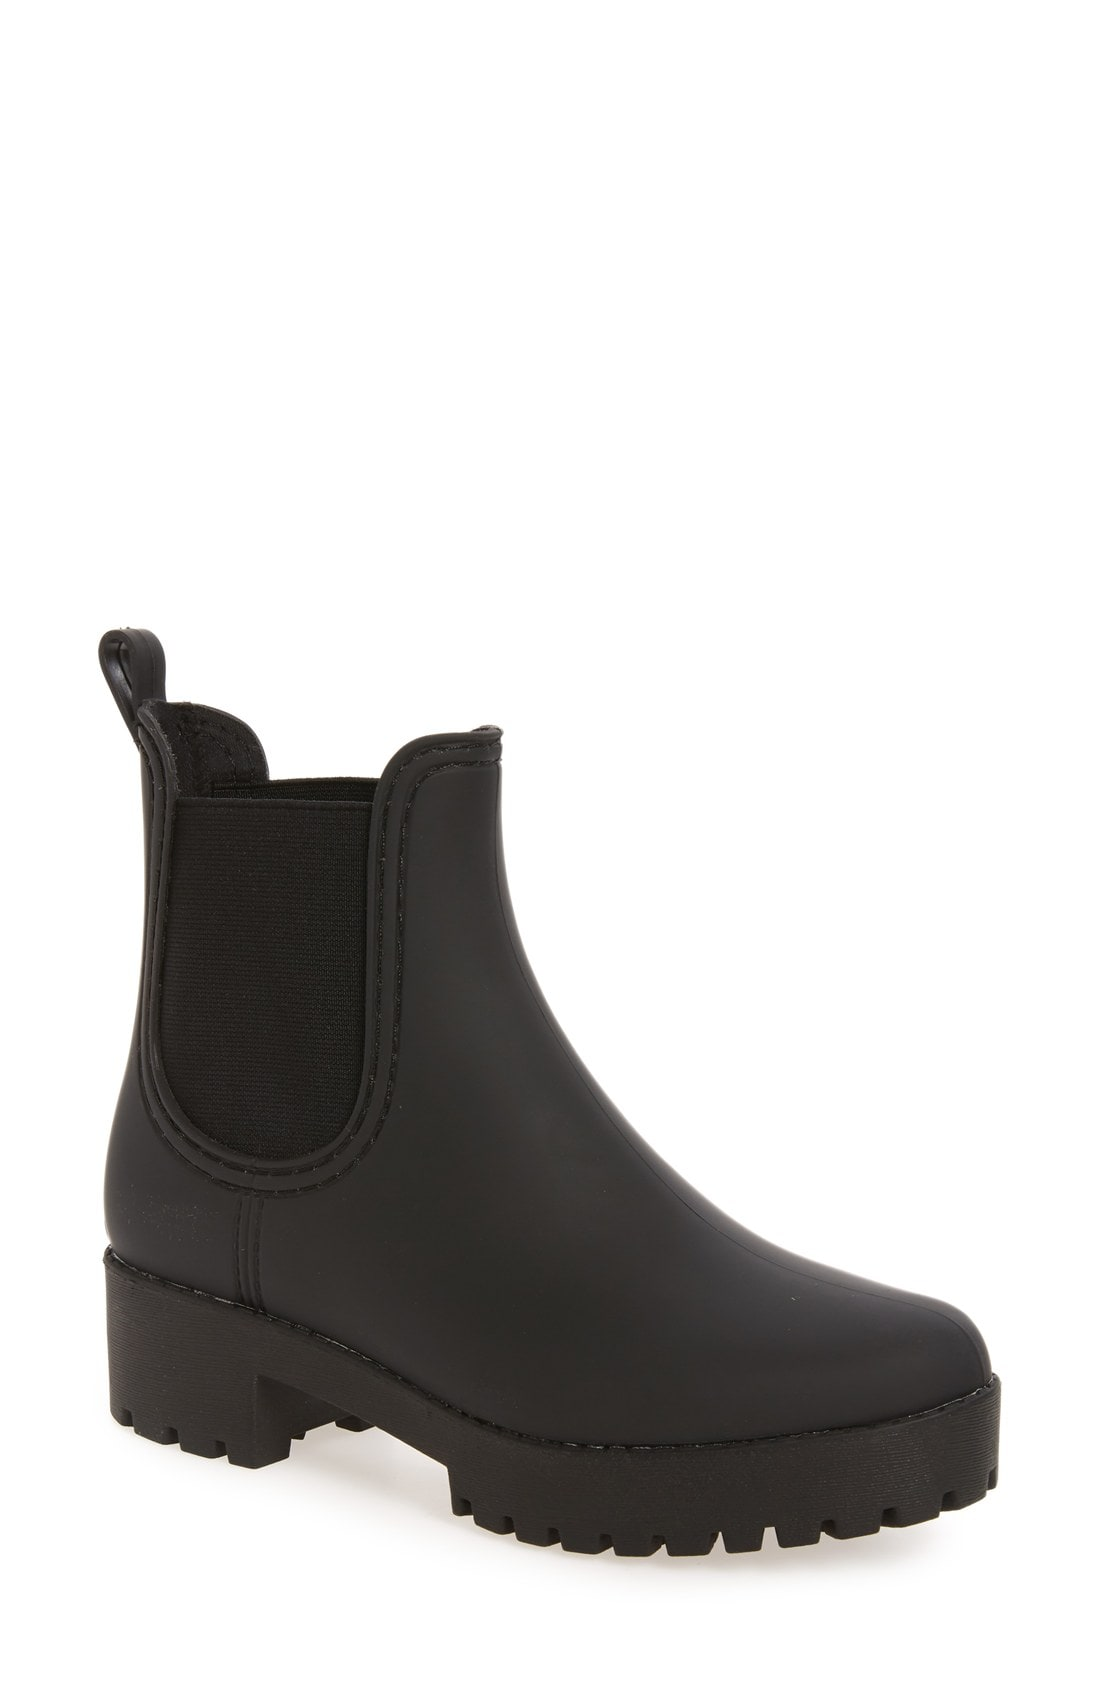 black ankle boots | Nordstrom